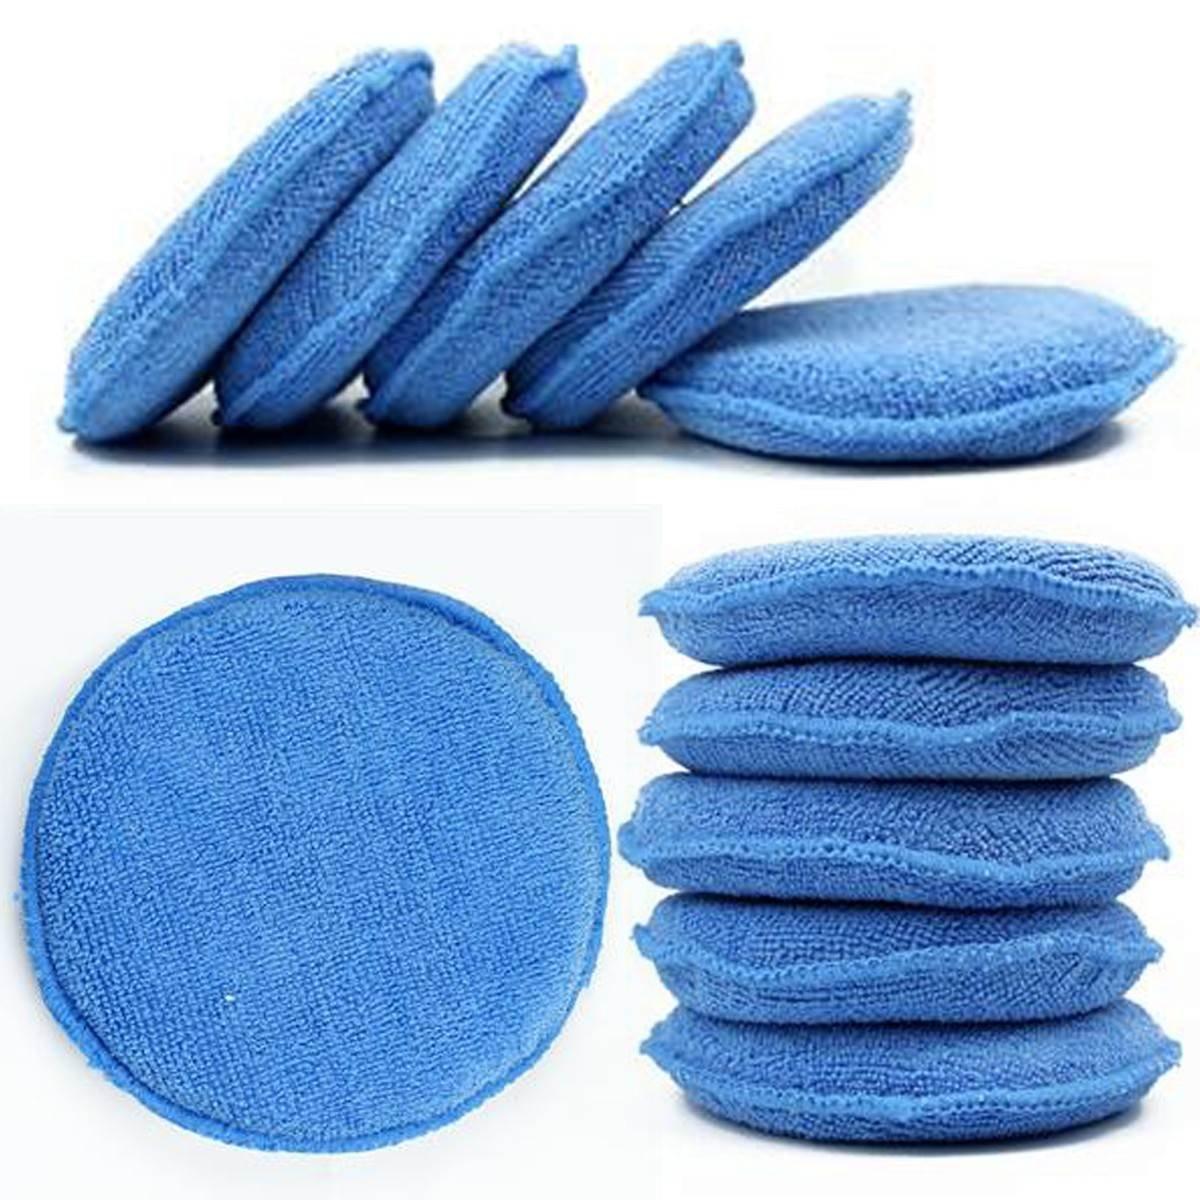 WINOMO Car Wax Sponge Waxing Polish Wax Foam Sponge Applicator Pads Cars Vehicle Glass Clean (10PCS/Set) by WINOMO (Image #1)